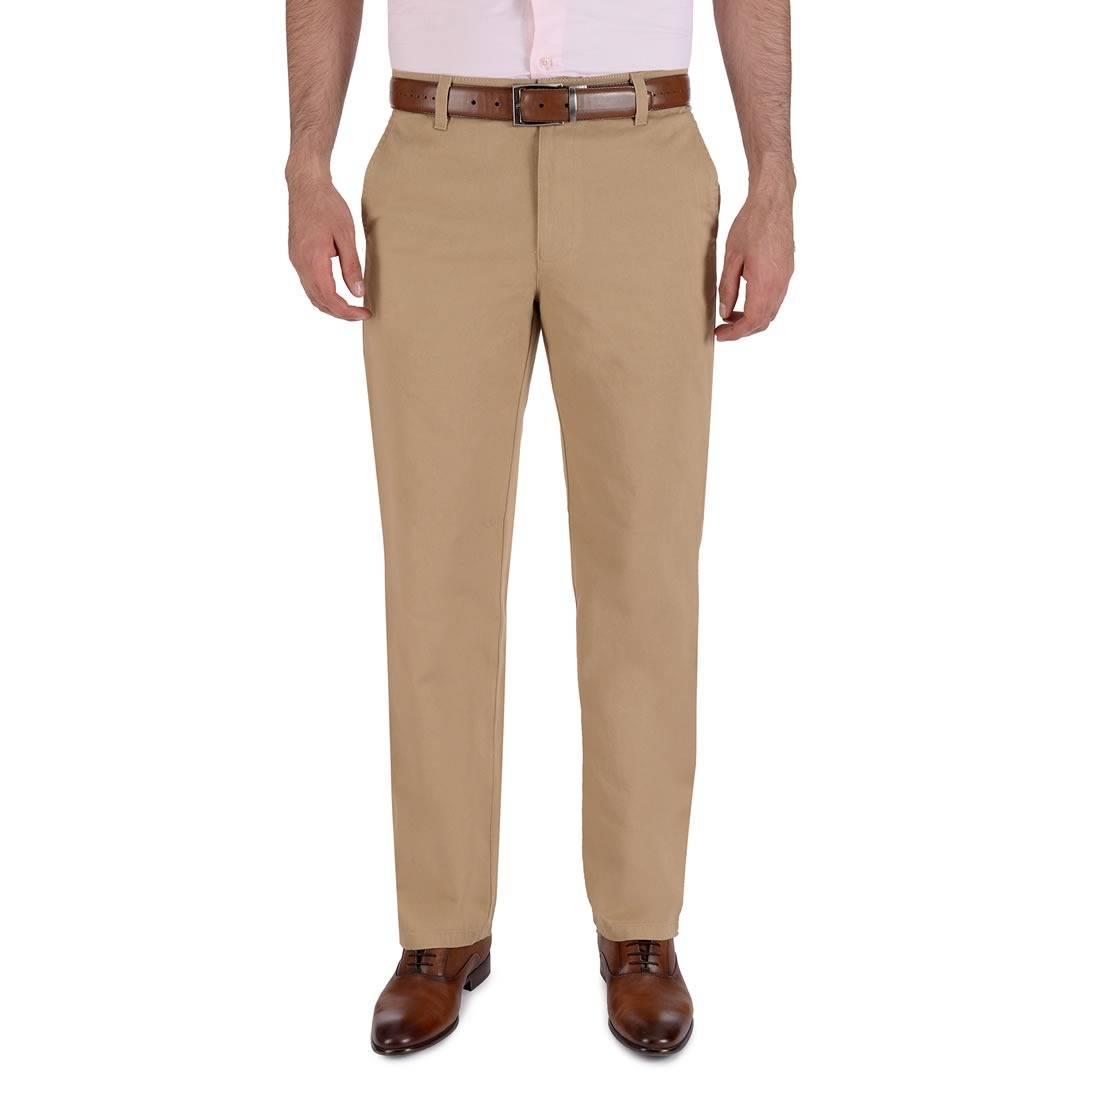 010811074467-01-Pantalon-Casual-Sin-Pinzas-Classic-Fit-Kaki-yale